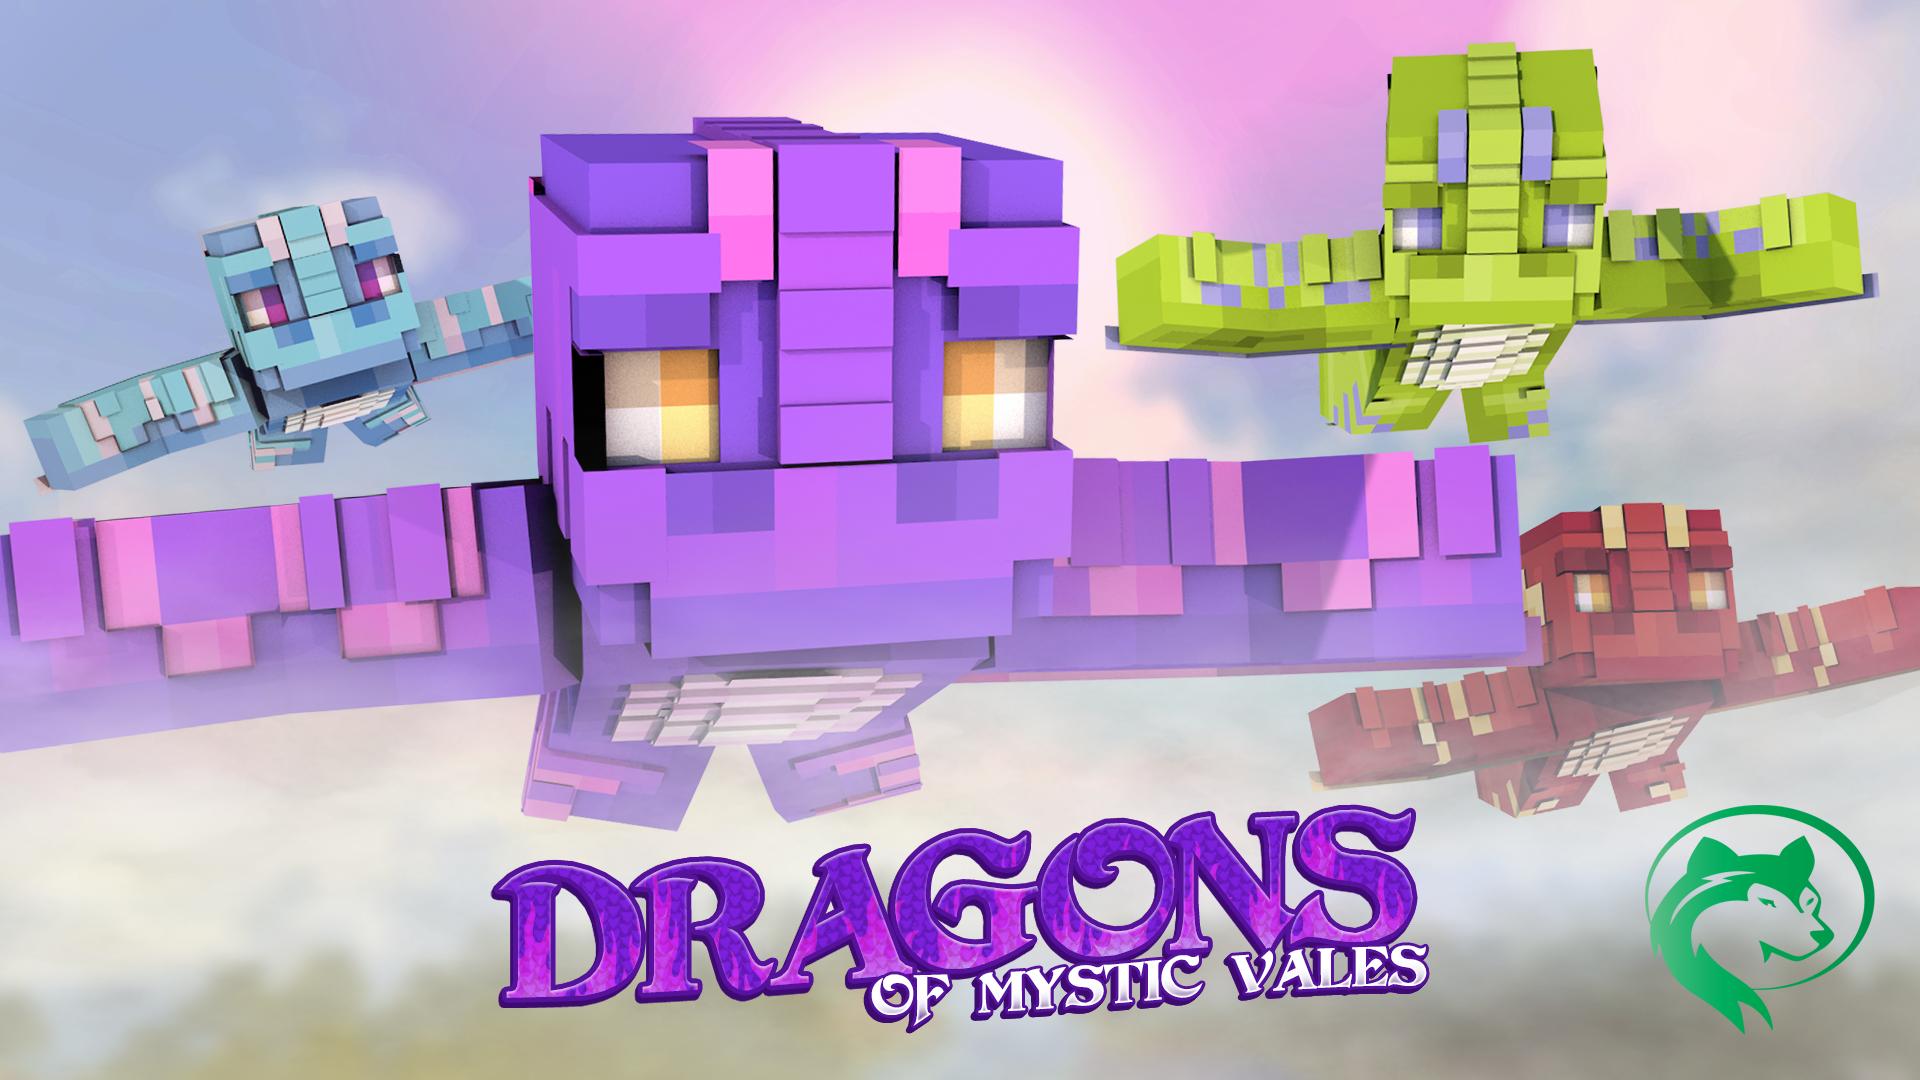 MysticVale_Dragons.png